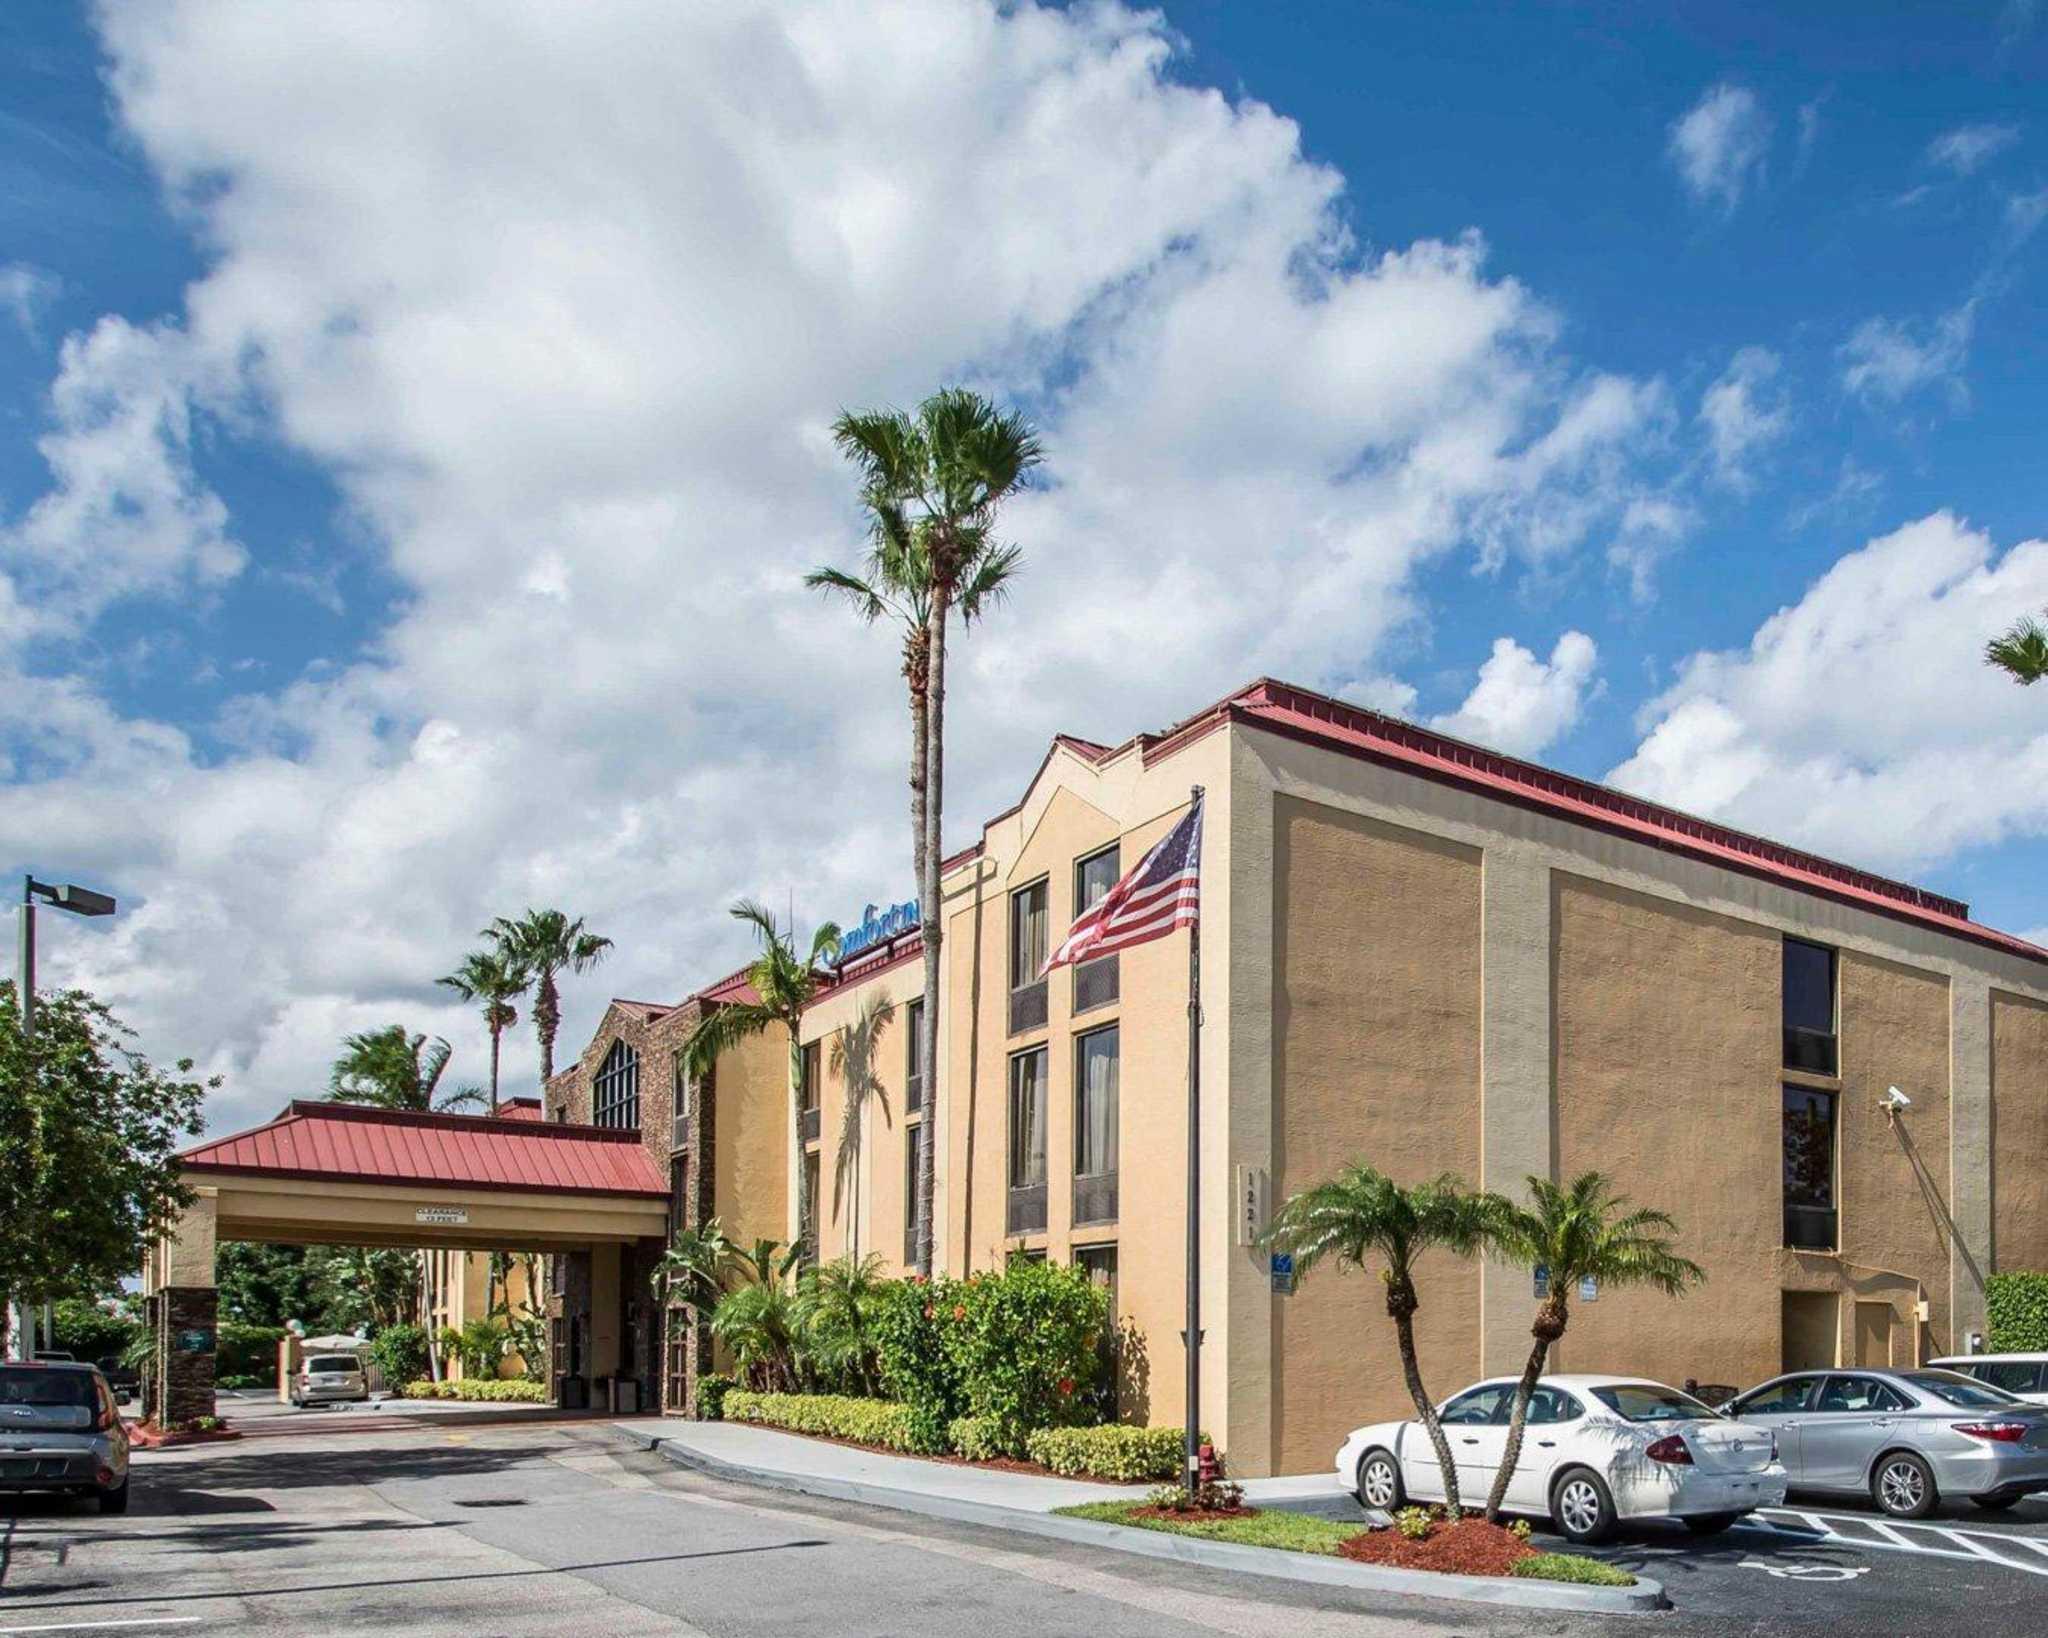 Comfort Inn & Suites Lantana - West Palm Beach South image 1